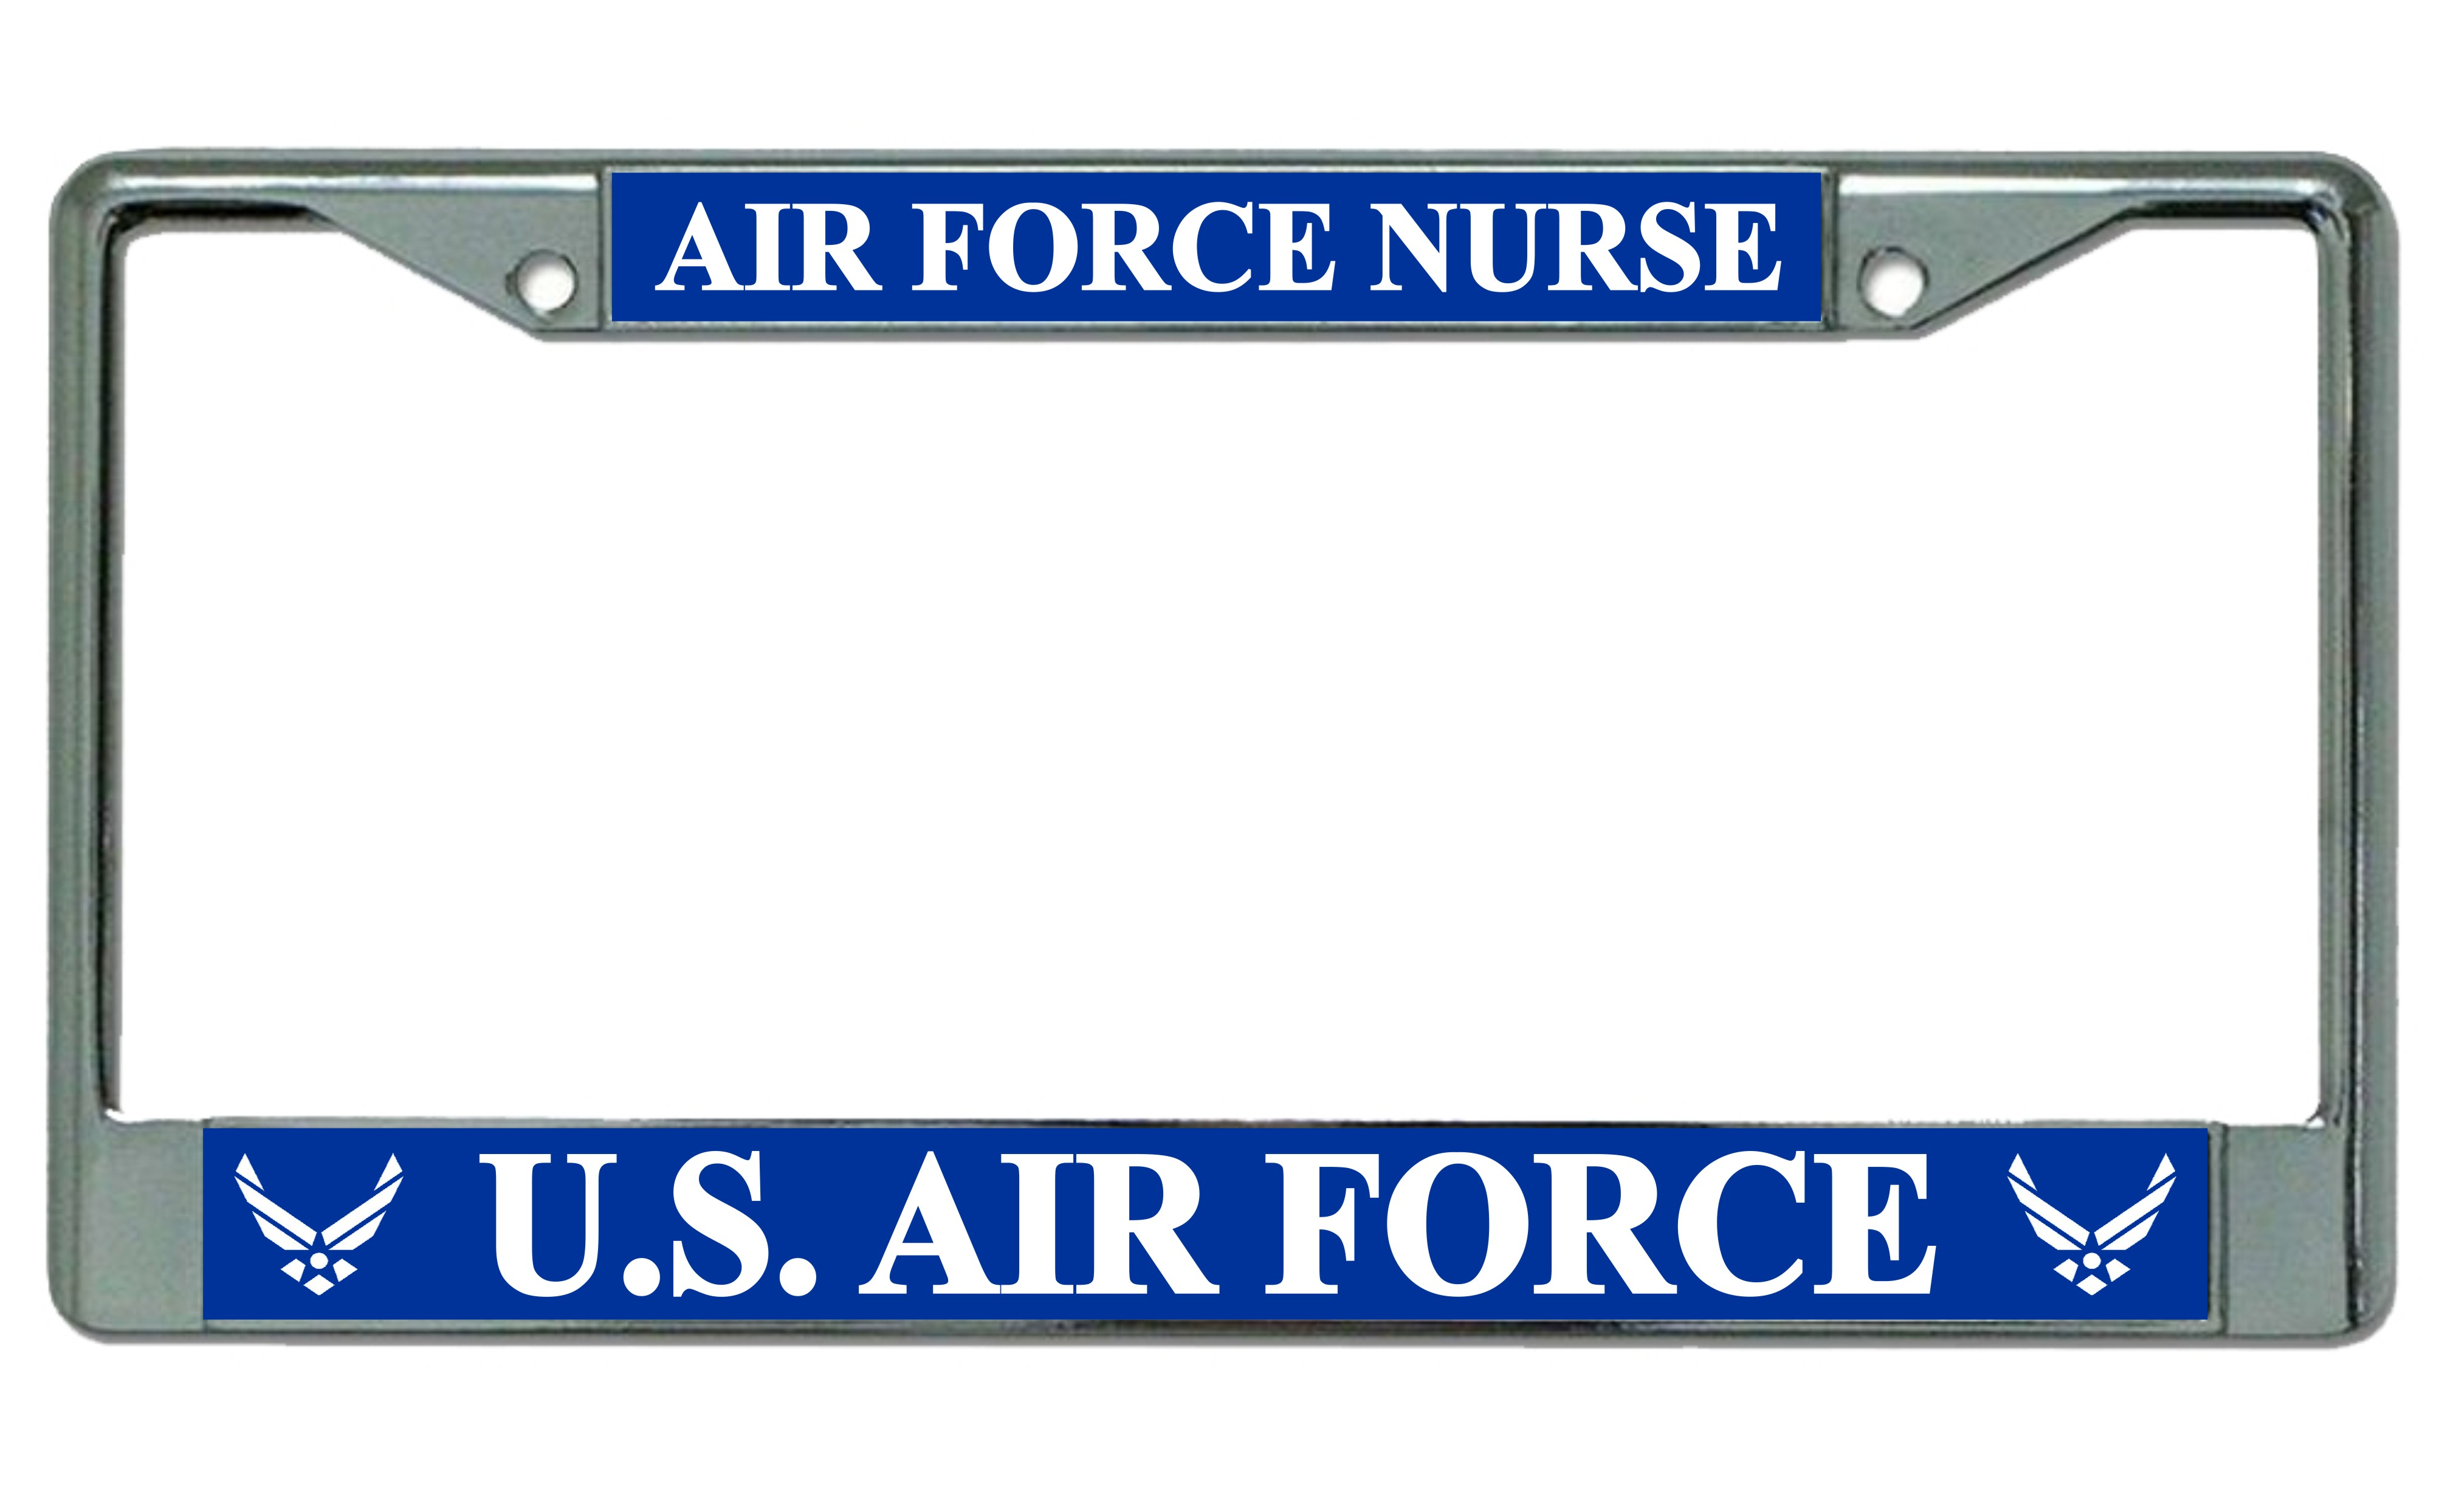 U.S. Air Force Nurse Photo License Plate Frame U.S. Air Force Nurse ...